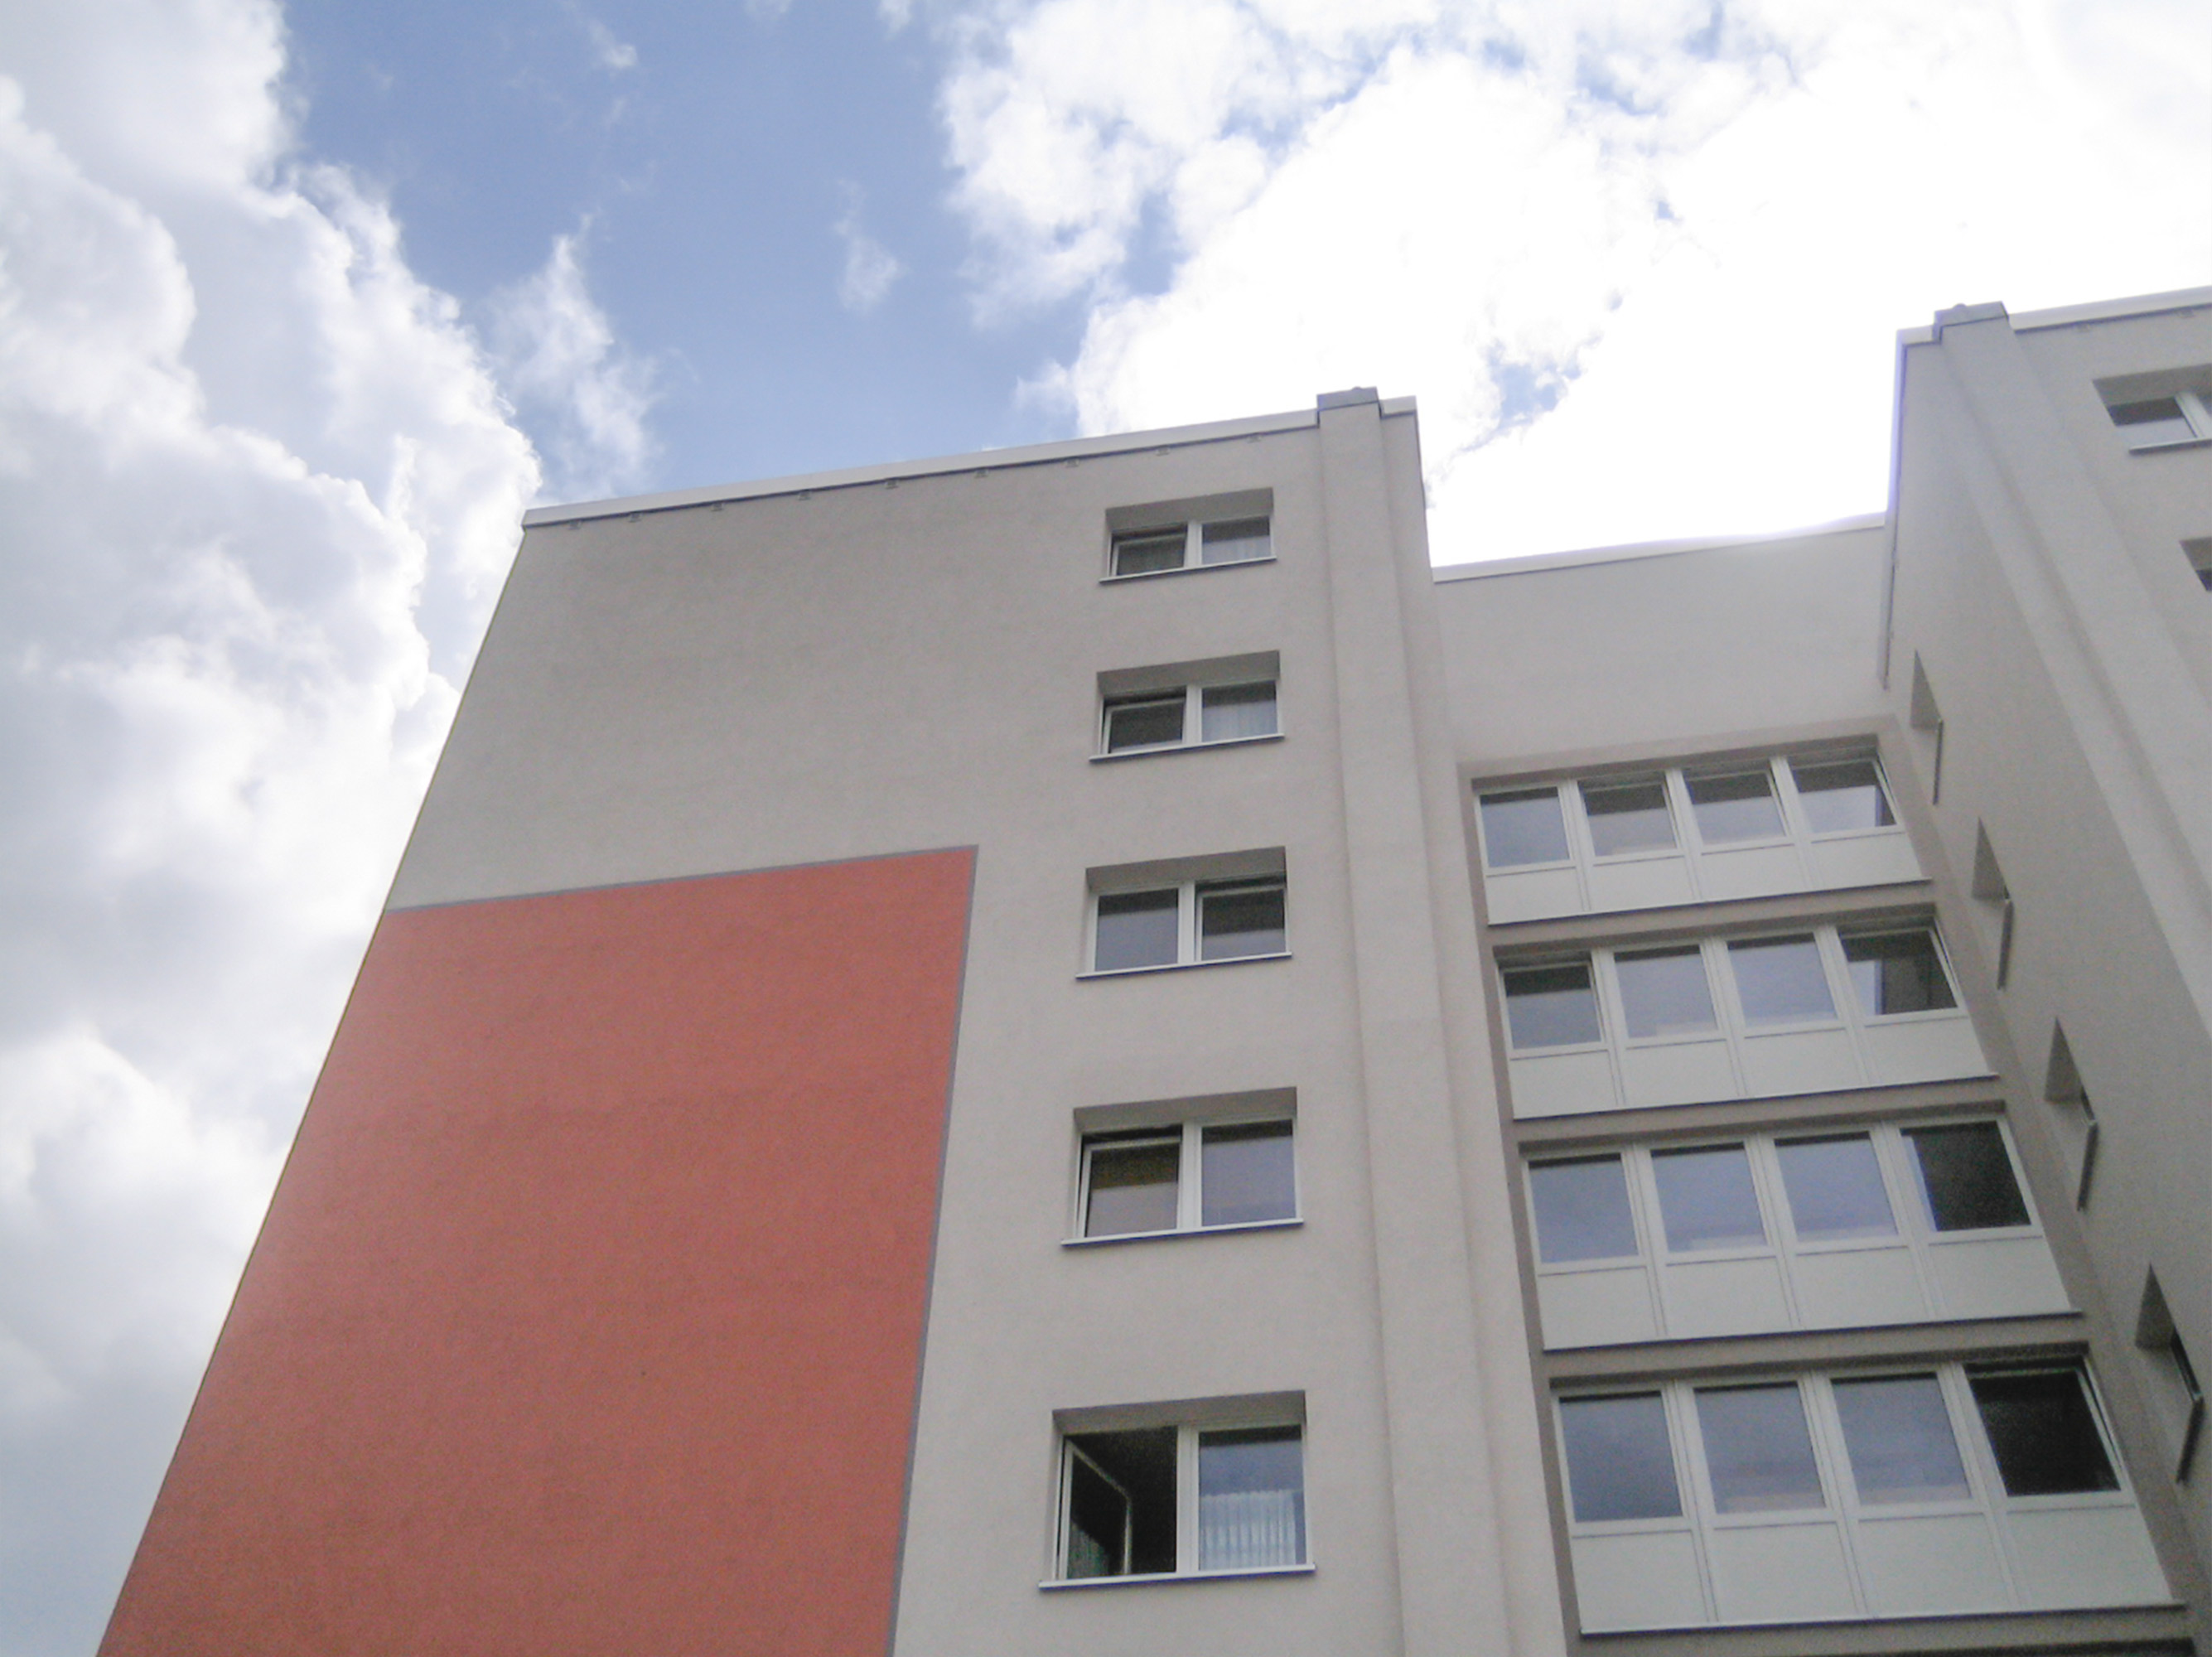 Wormser Weg, Düsseldorf